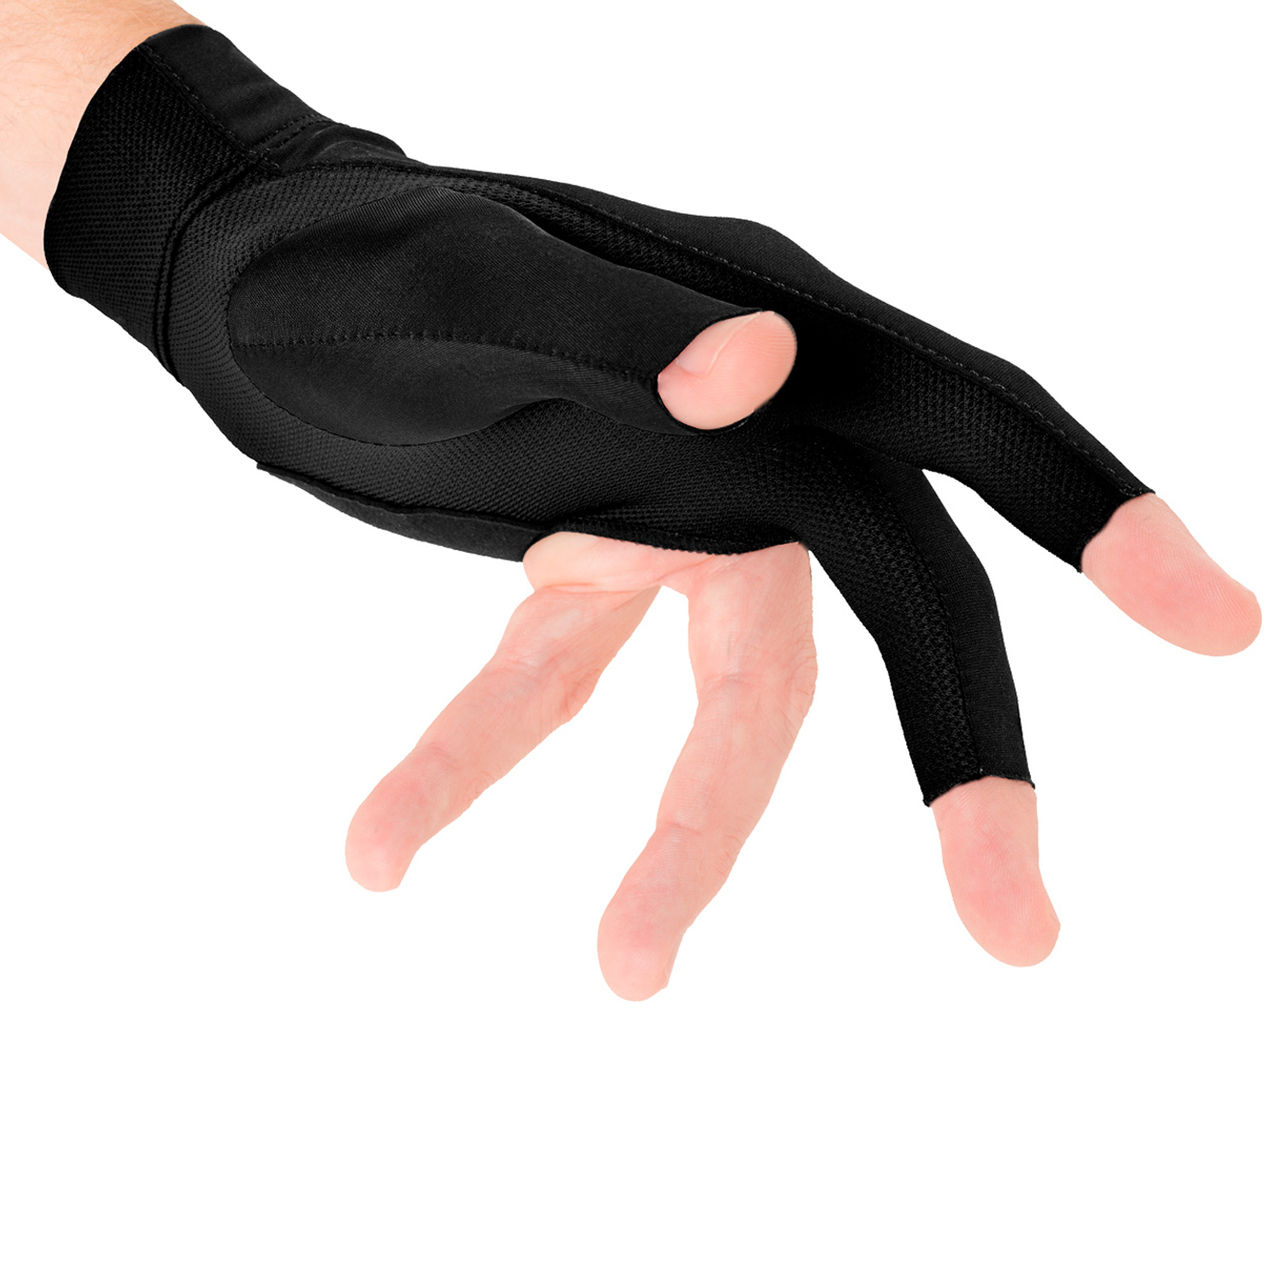 Predator Second Skin Pool Glove -  Side View